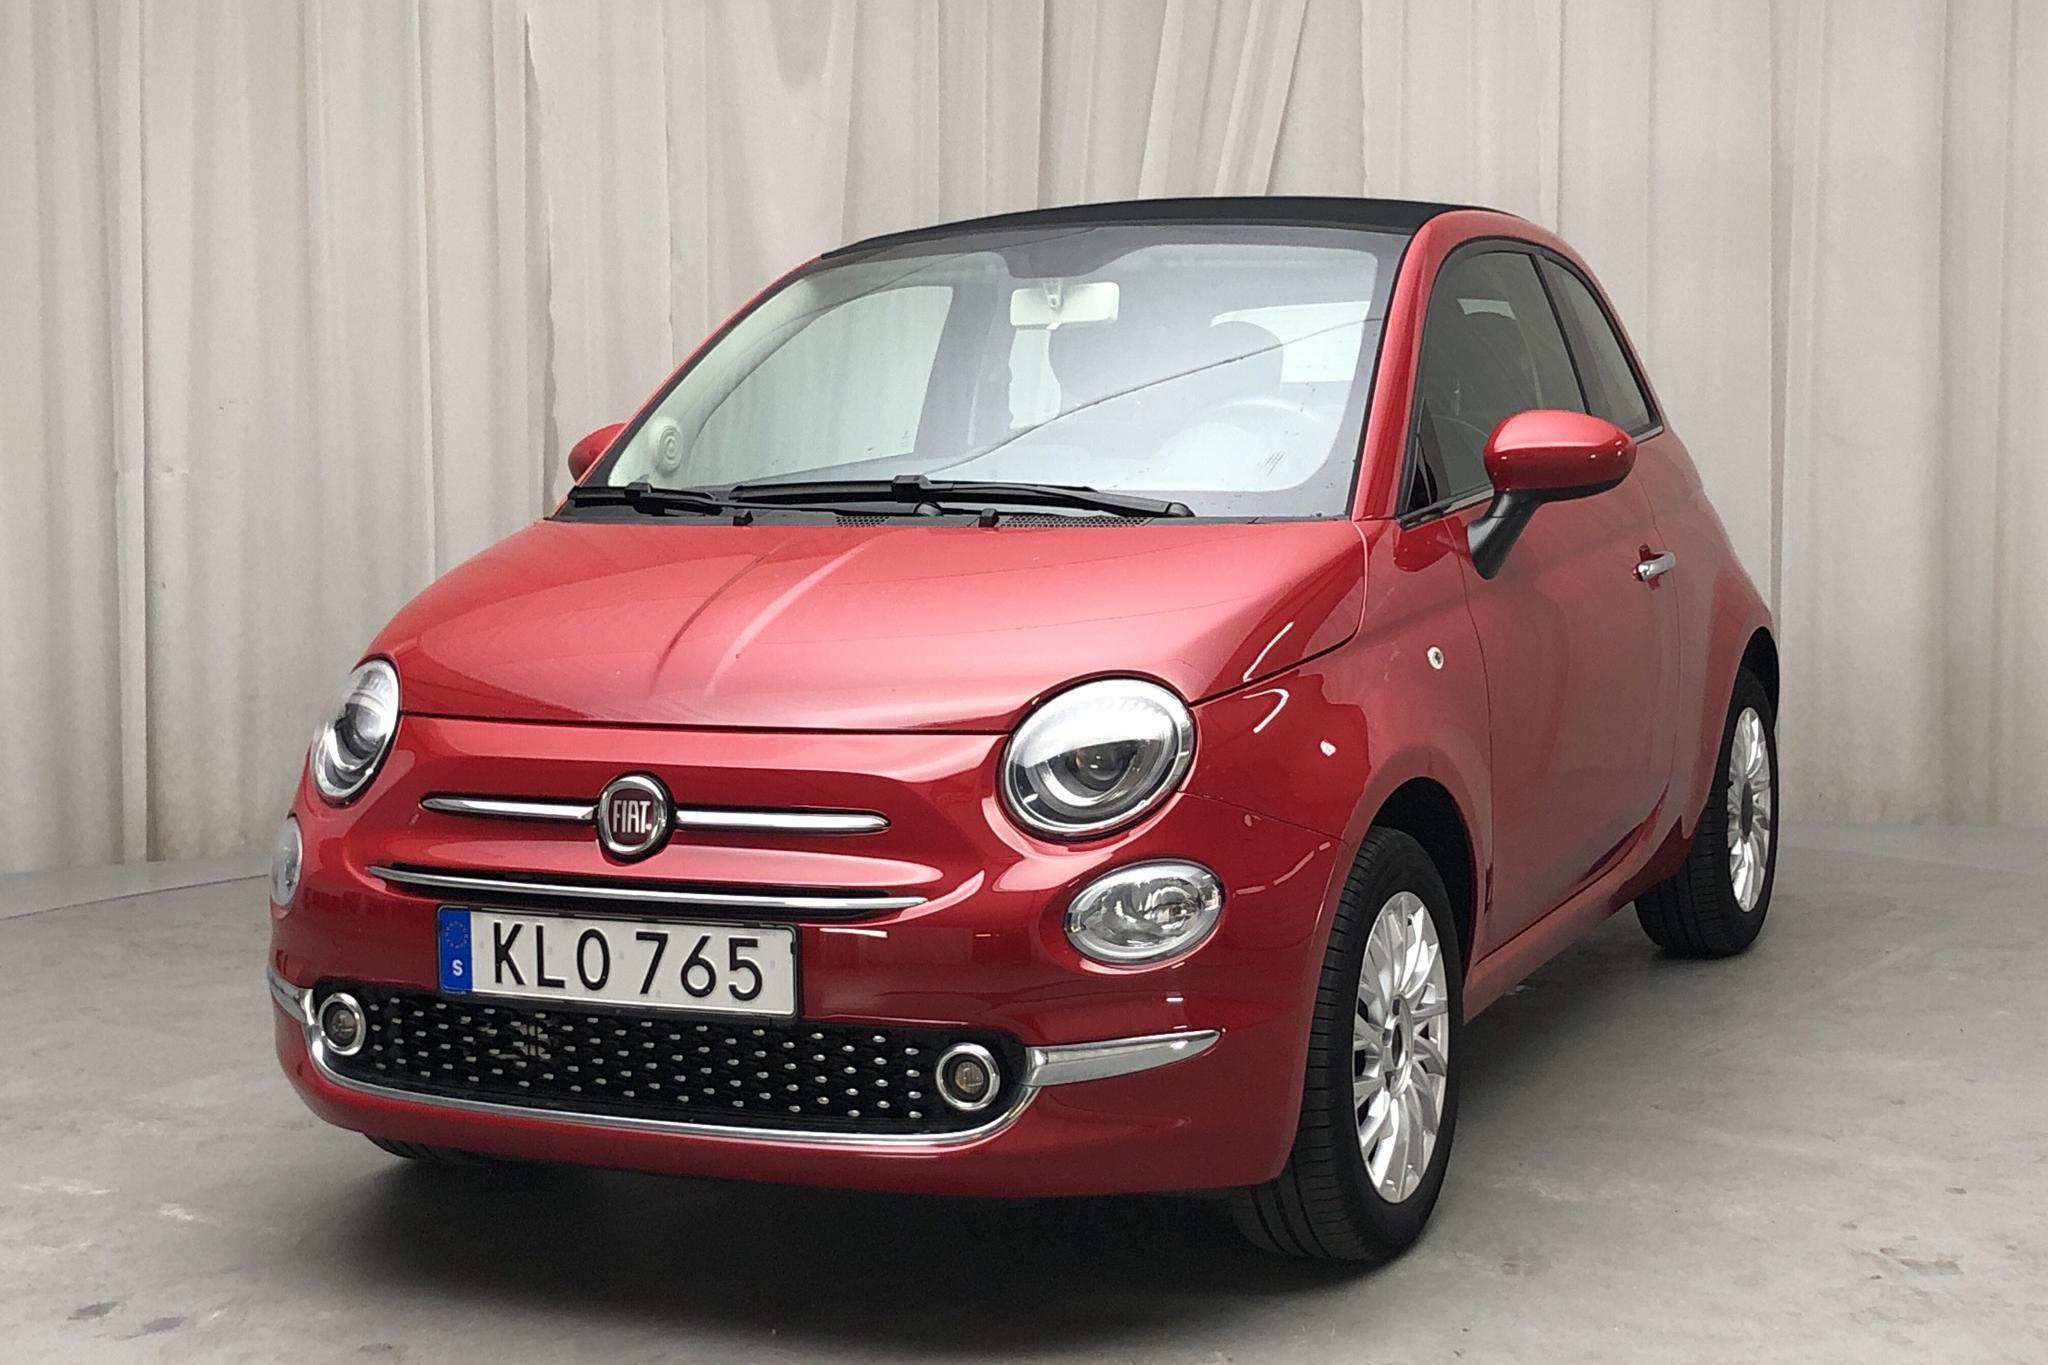 Fiat 500C 1.2 (69hk) - 5 884 mil - Manuell - röd - 2018